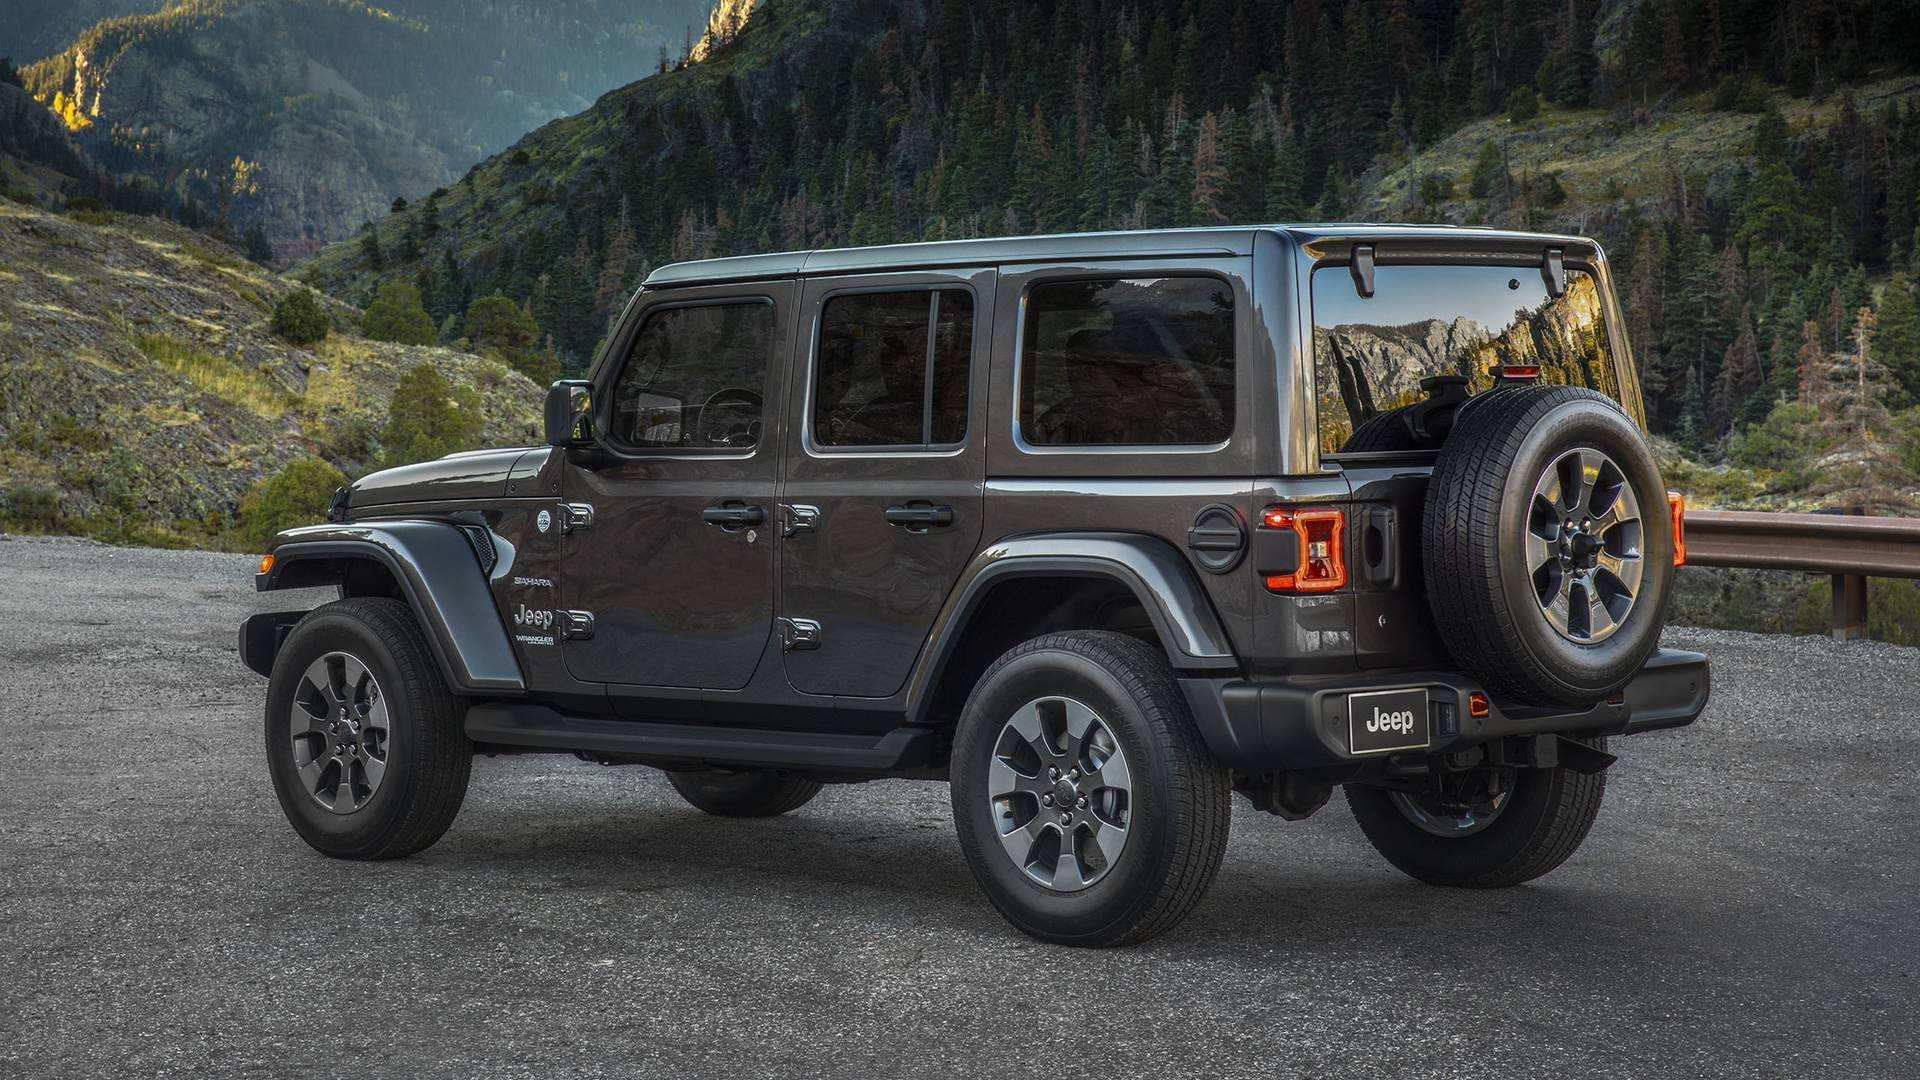 66 The 2019 Jeep Wrangler Jl Spy Shoot for 2019 Jeep Wrangler Jl